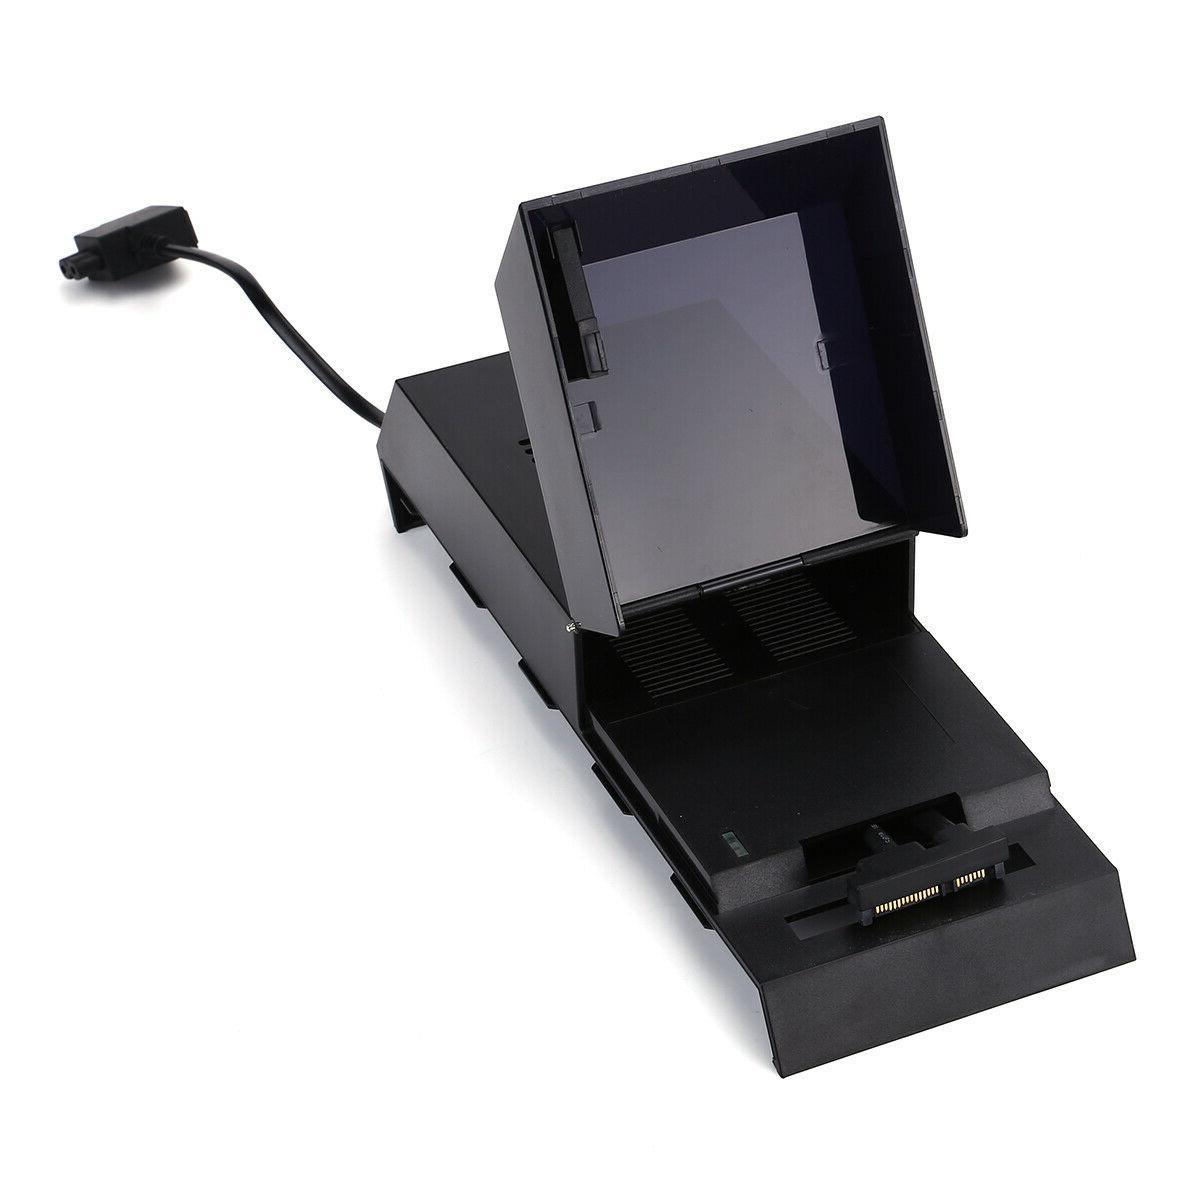 2TB HDD Data Box For Playstation